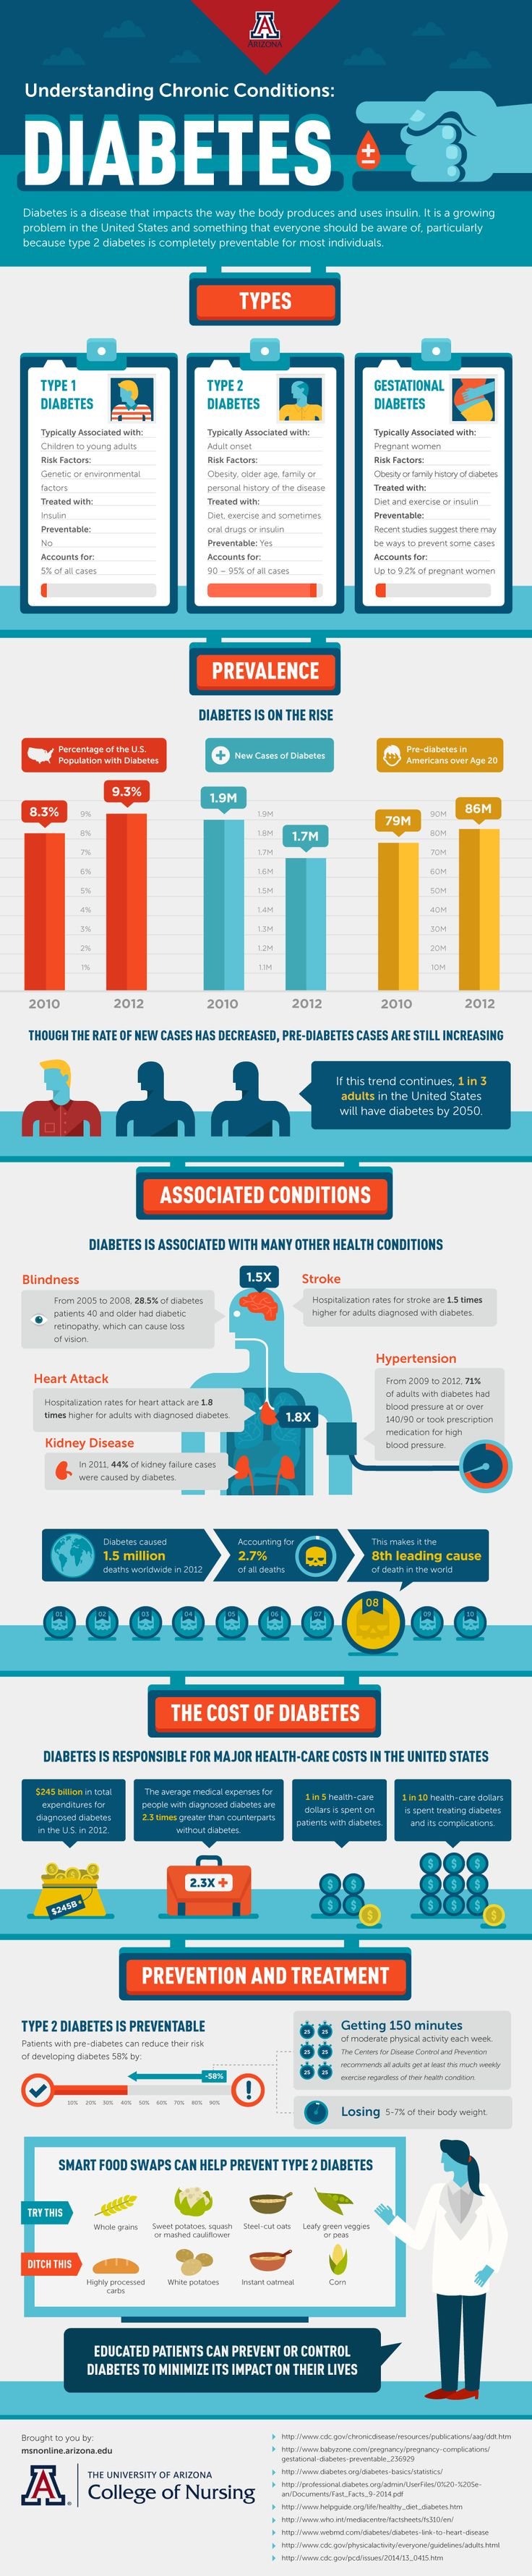 Understanding Chronic Conditions: Diabetes | Online RN to MSN | University of Arizona